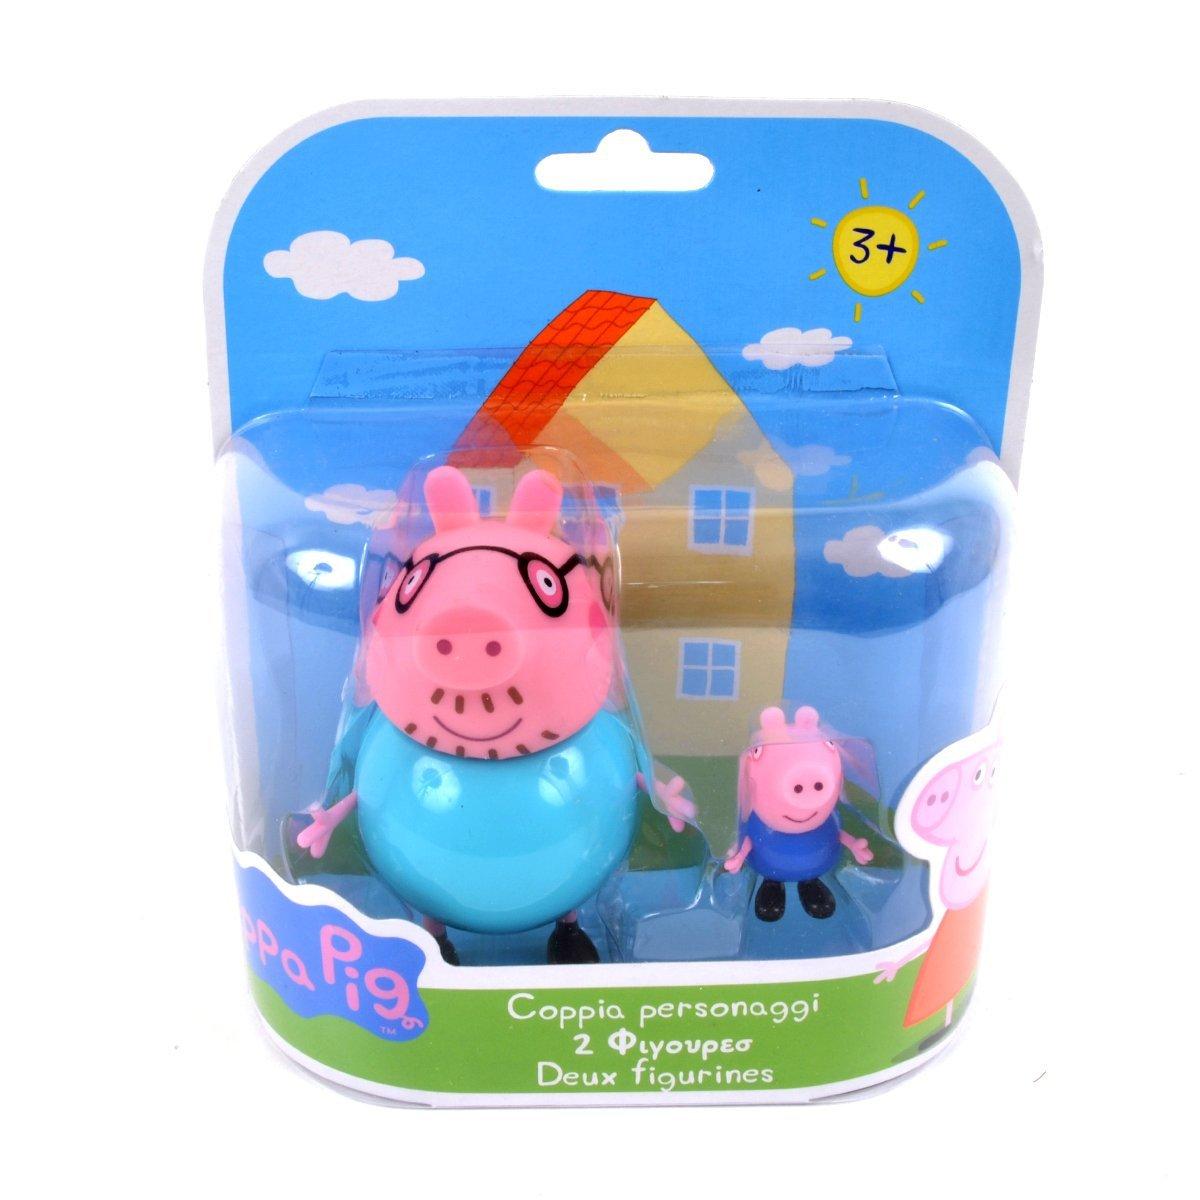 Blister Blister Figurines Peppa 2 Peppa 2 Pig Pig rdCxeoB